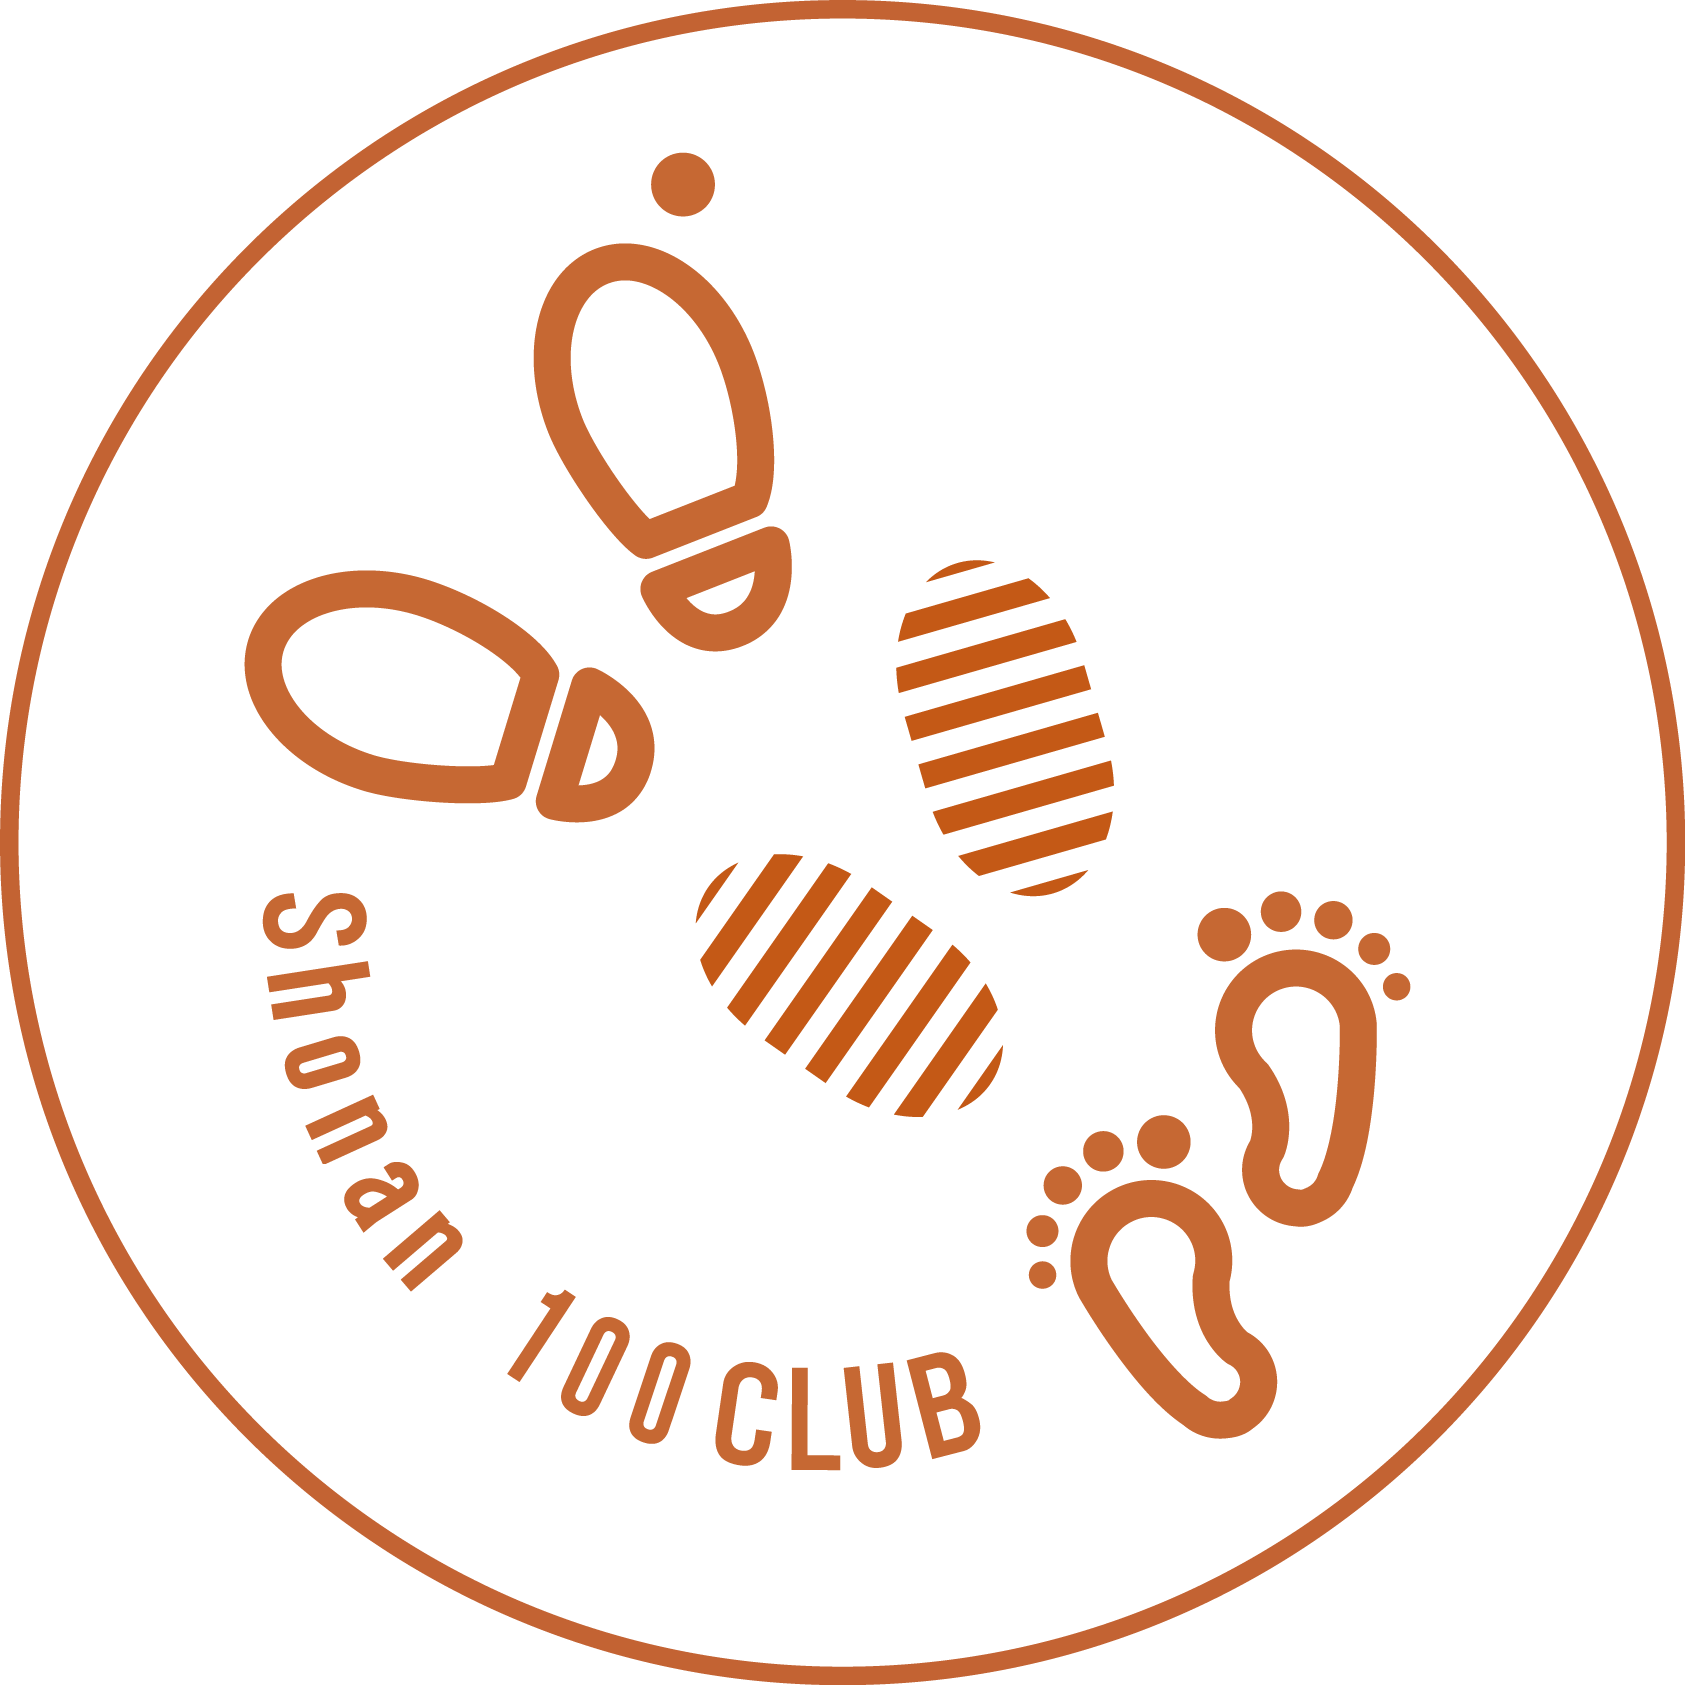 100club_round_logo